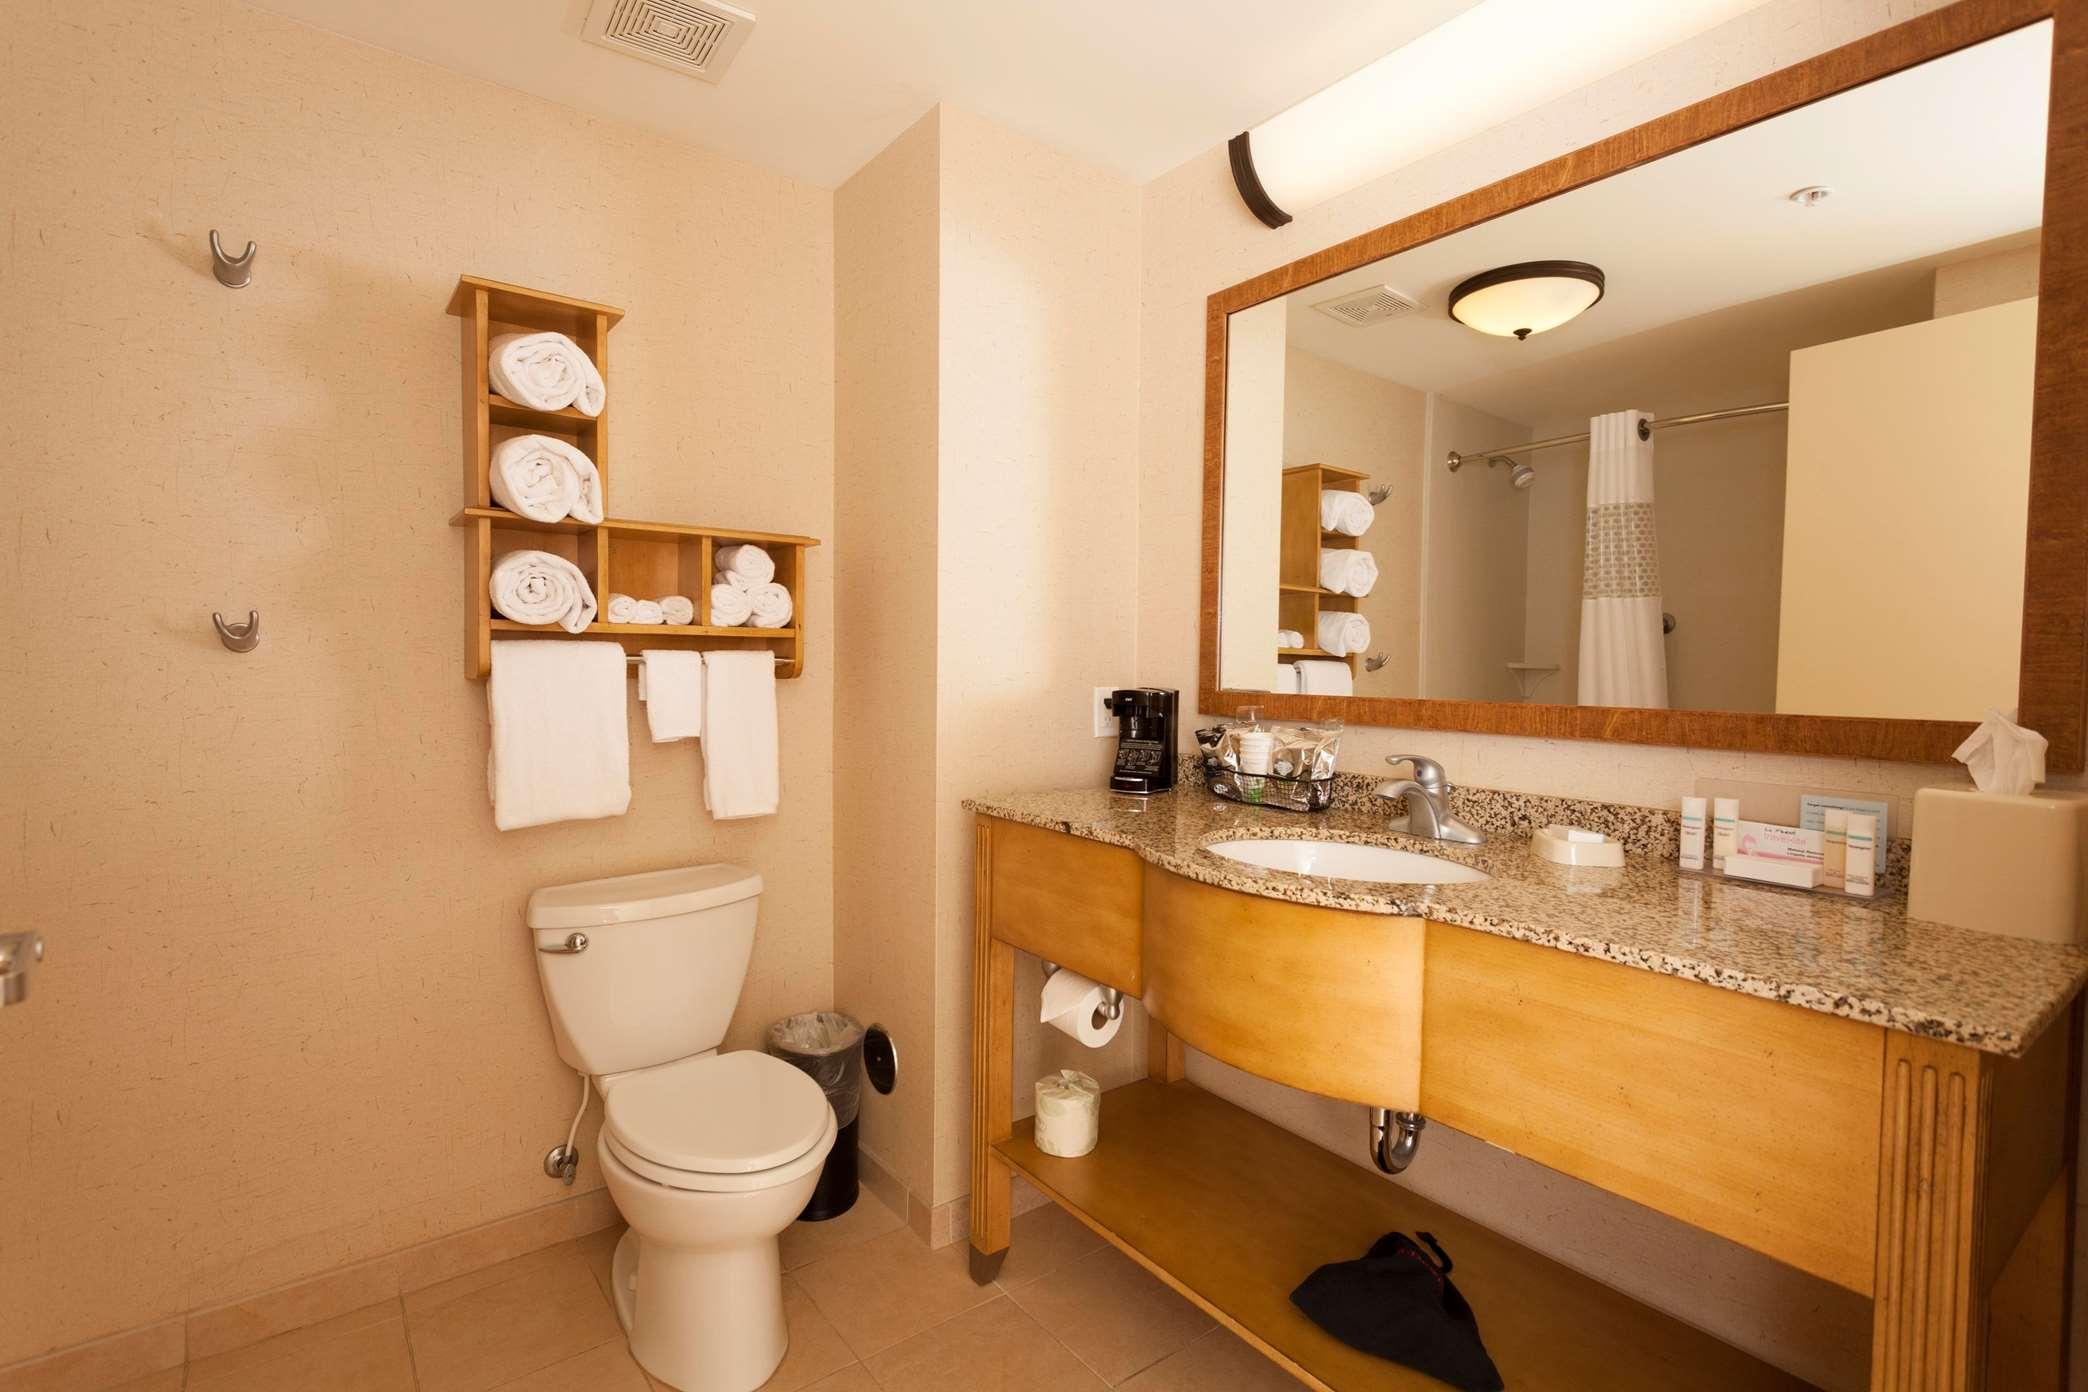 Hampton Inn & Suites Riverton image 8